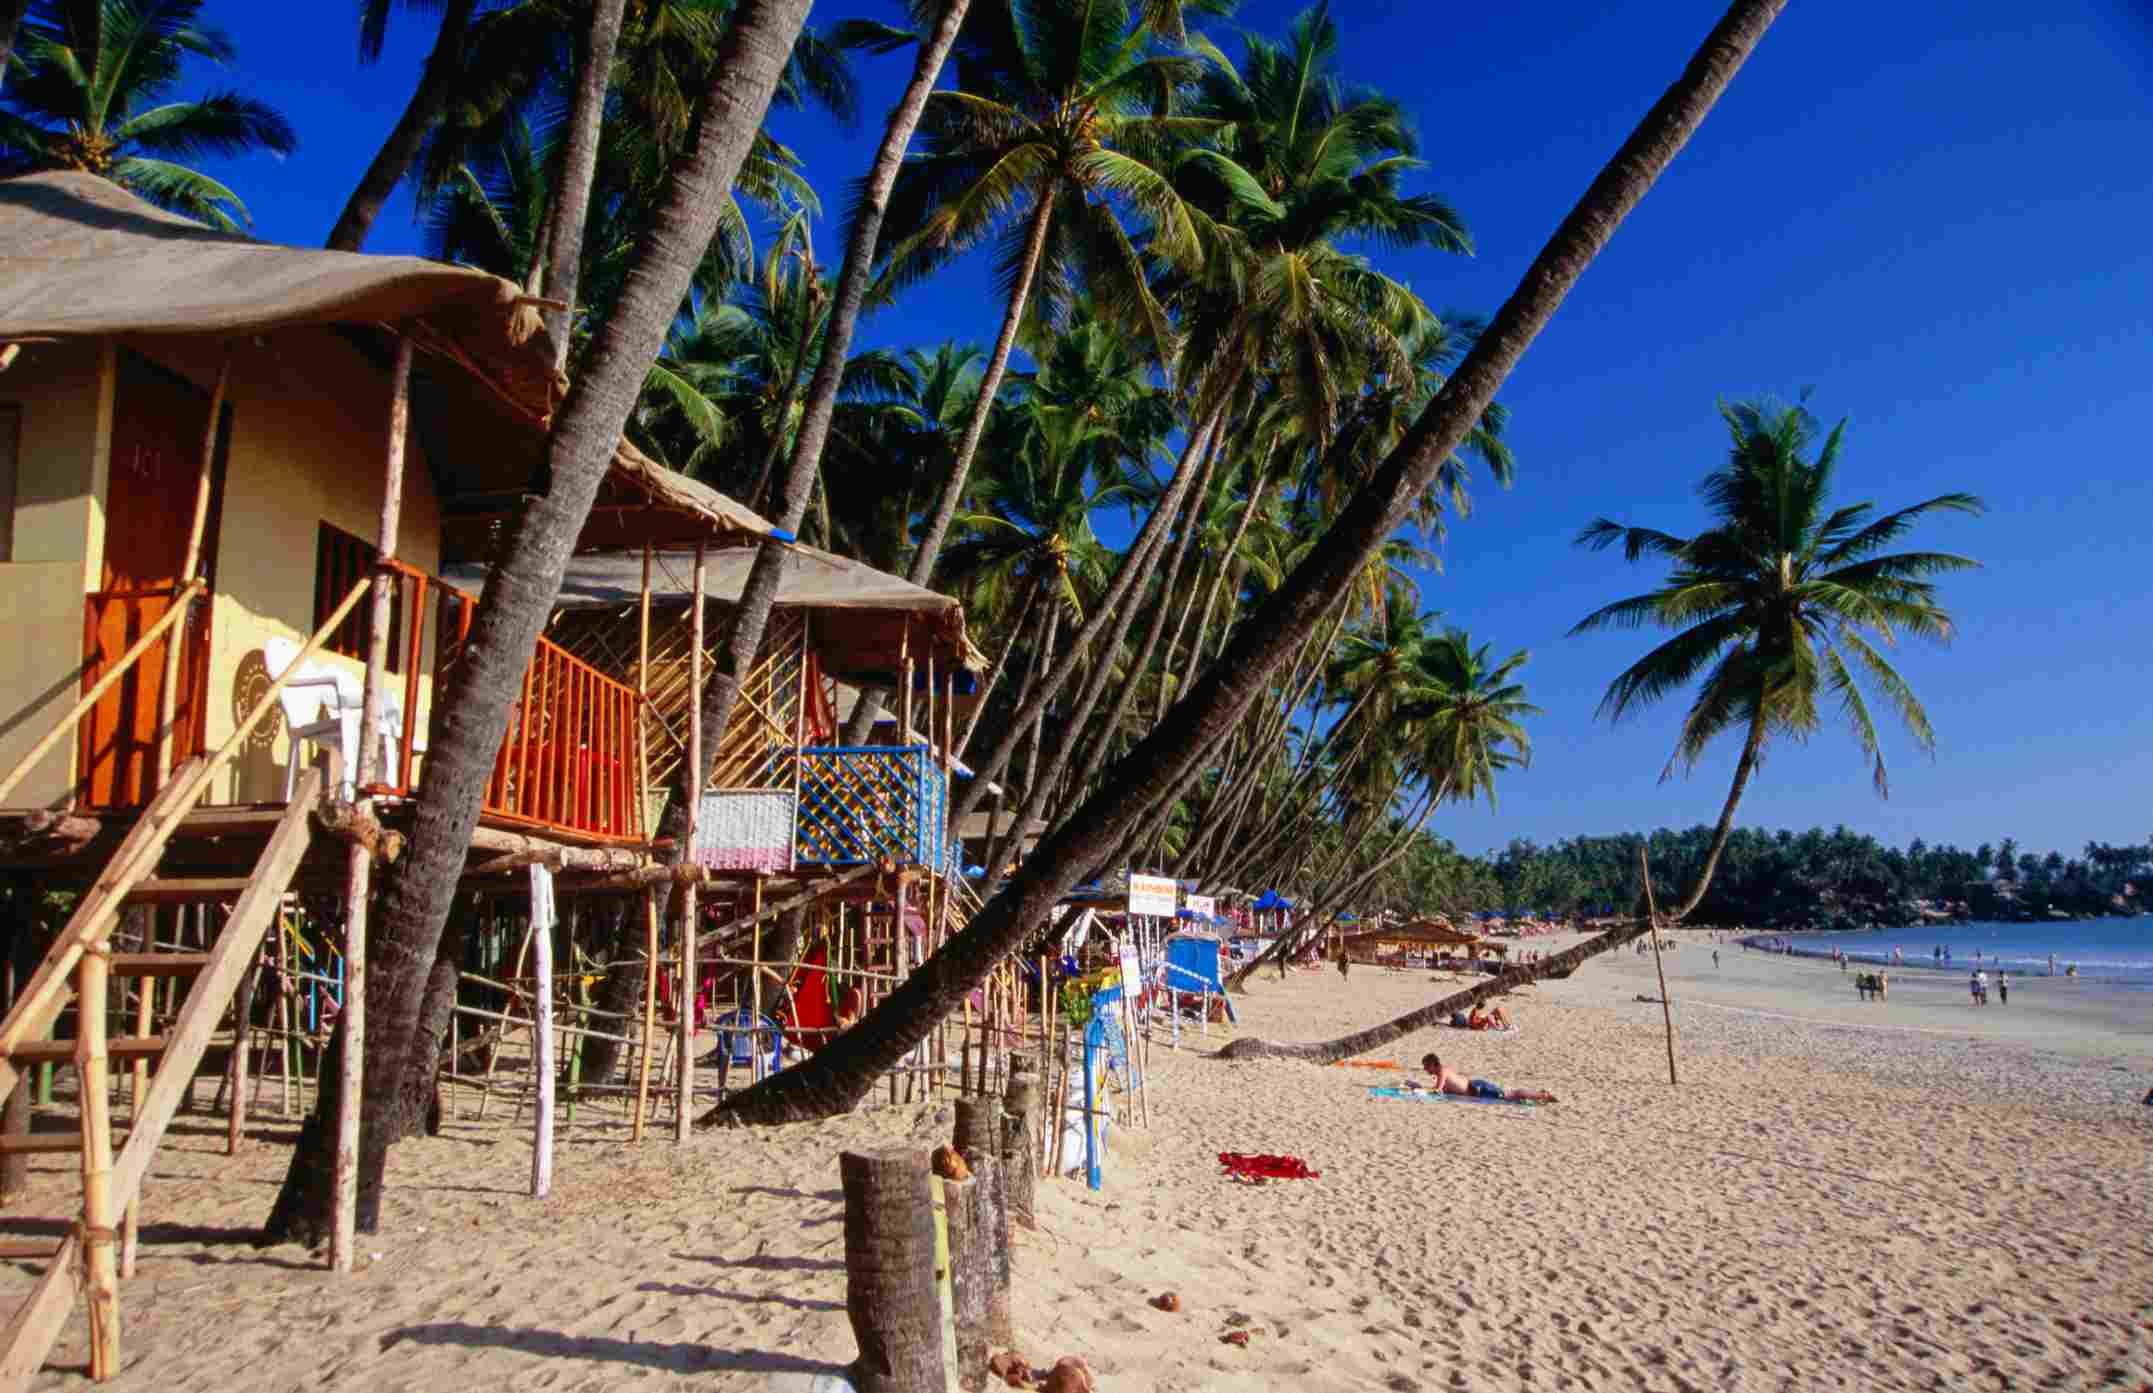 Chozas en la playa de Palolem, sur de Goa